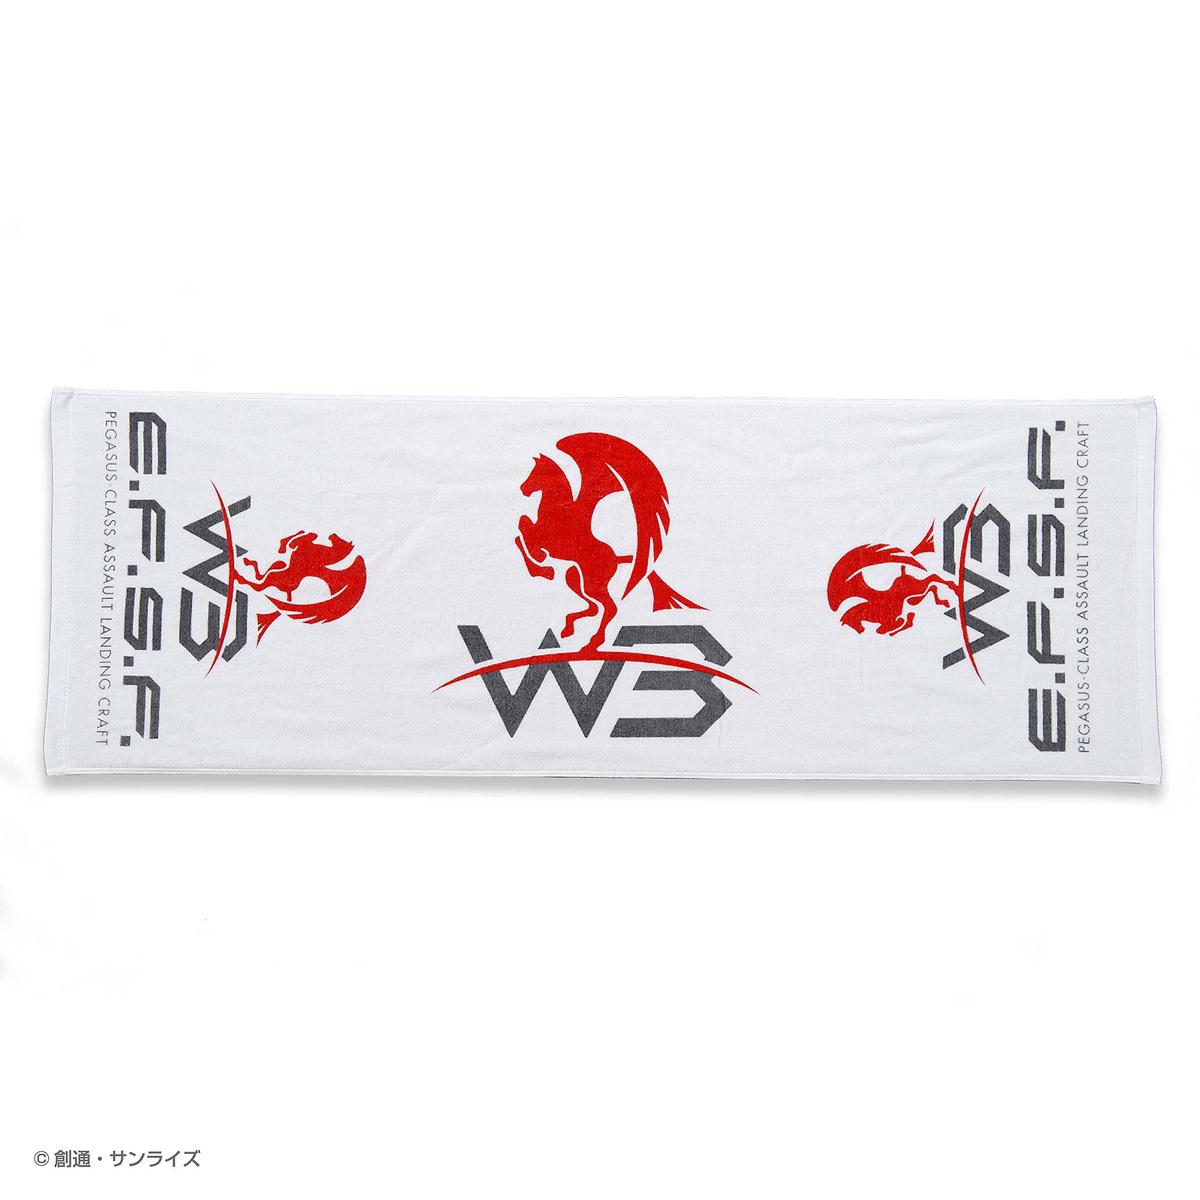 STRICT-G 『機動戦士ガンダム』 WHITE BASE スポーツタオル